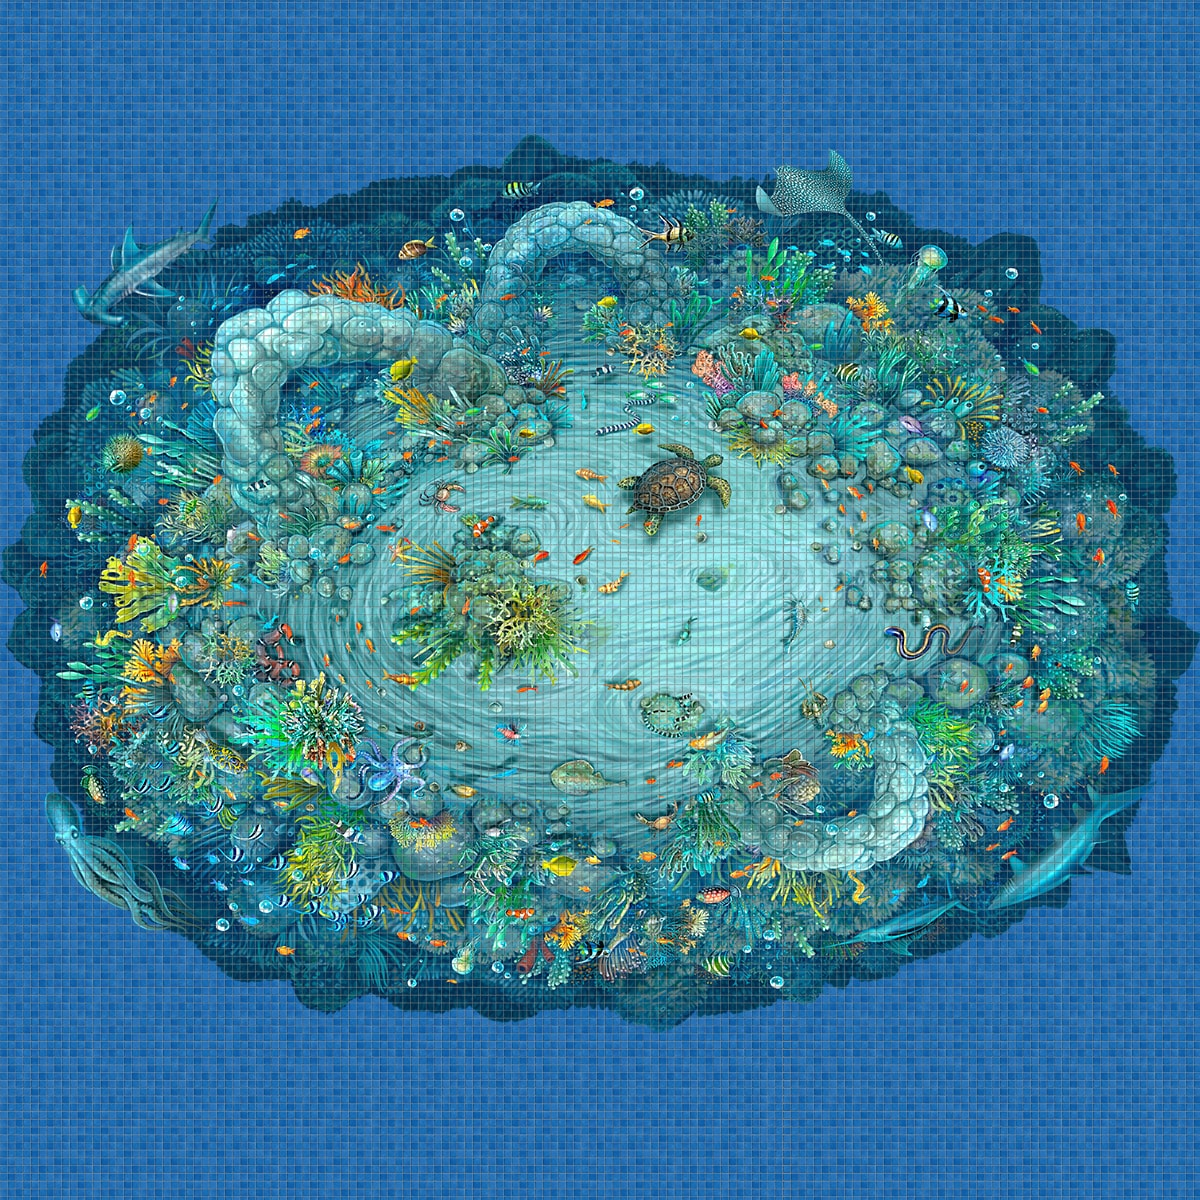 Sea-Life-Digital-Print-Mosaic-Ezarri.jpg